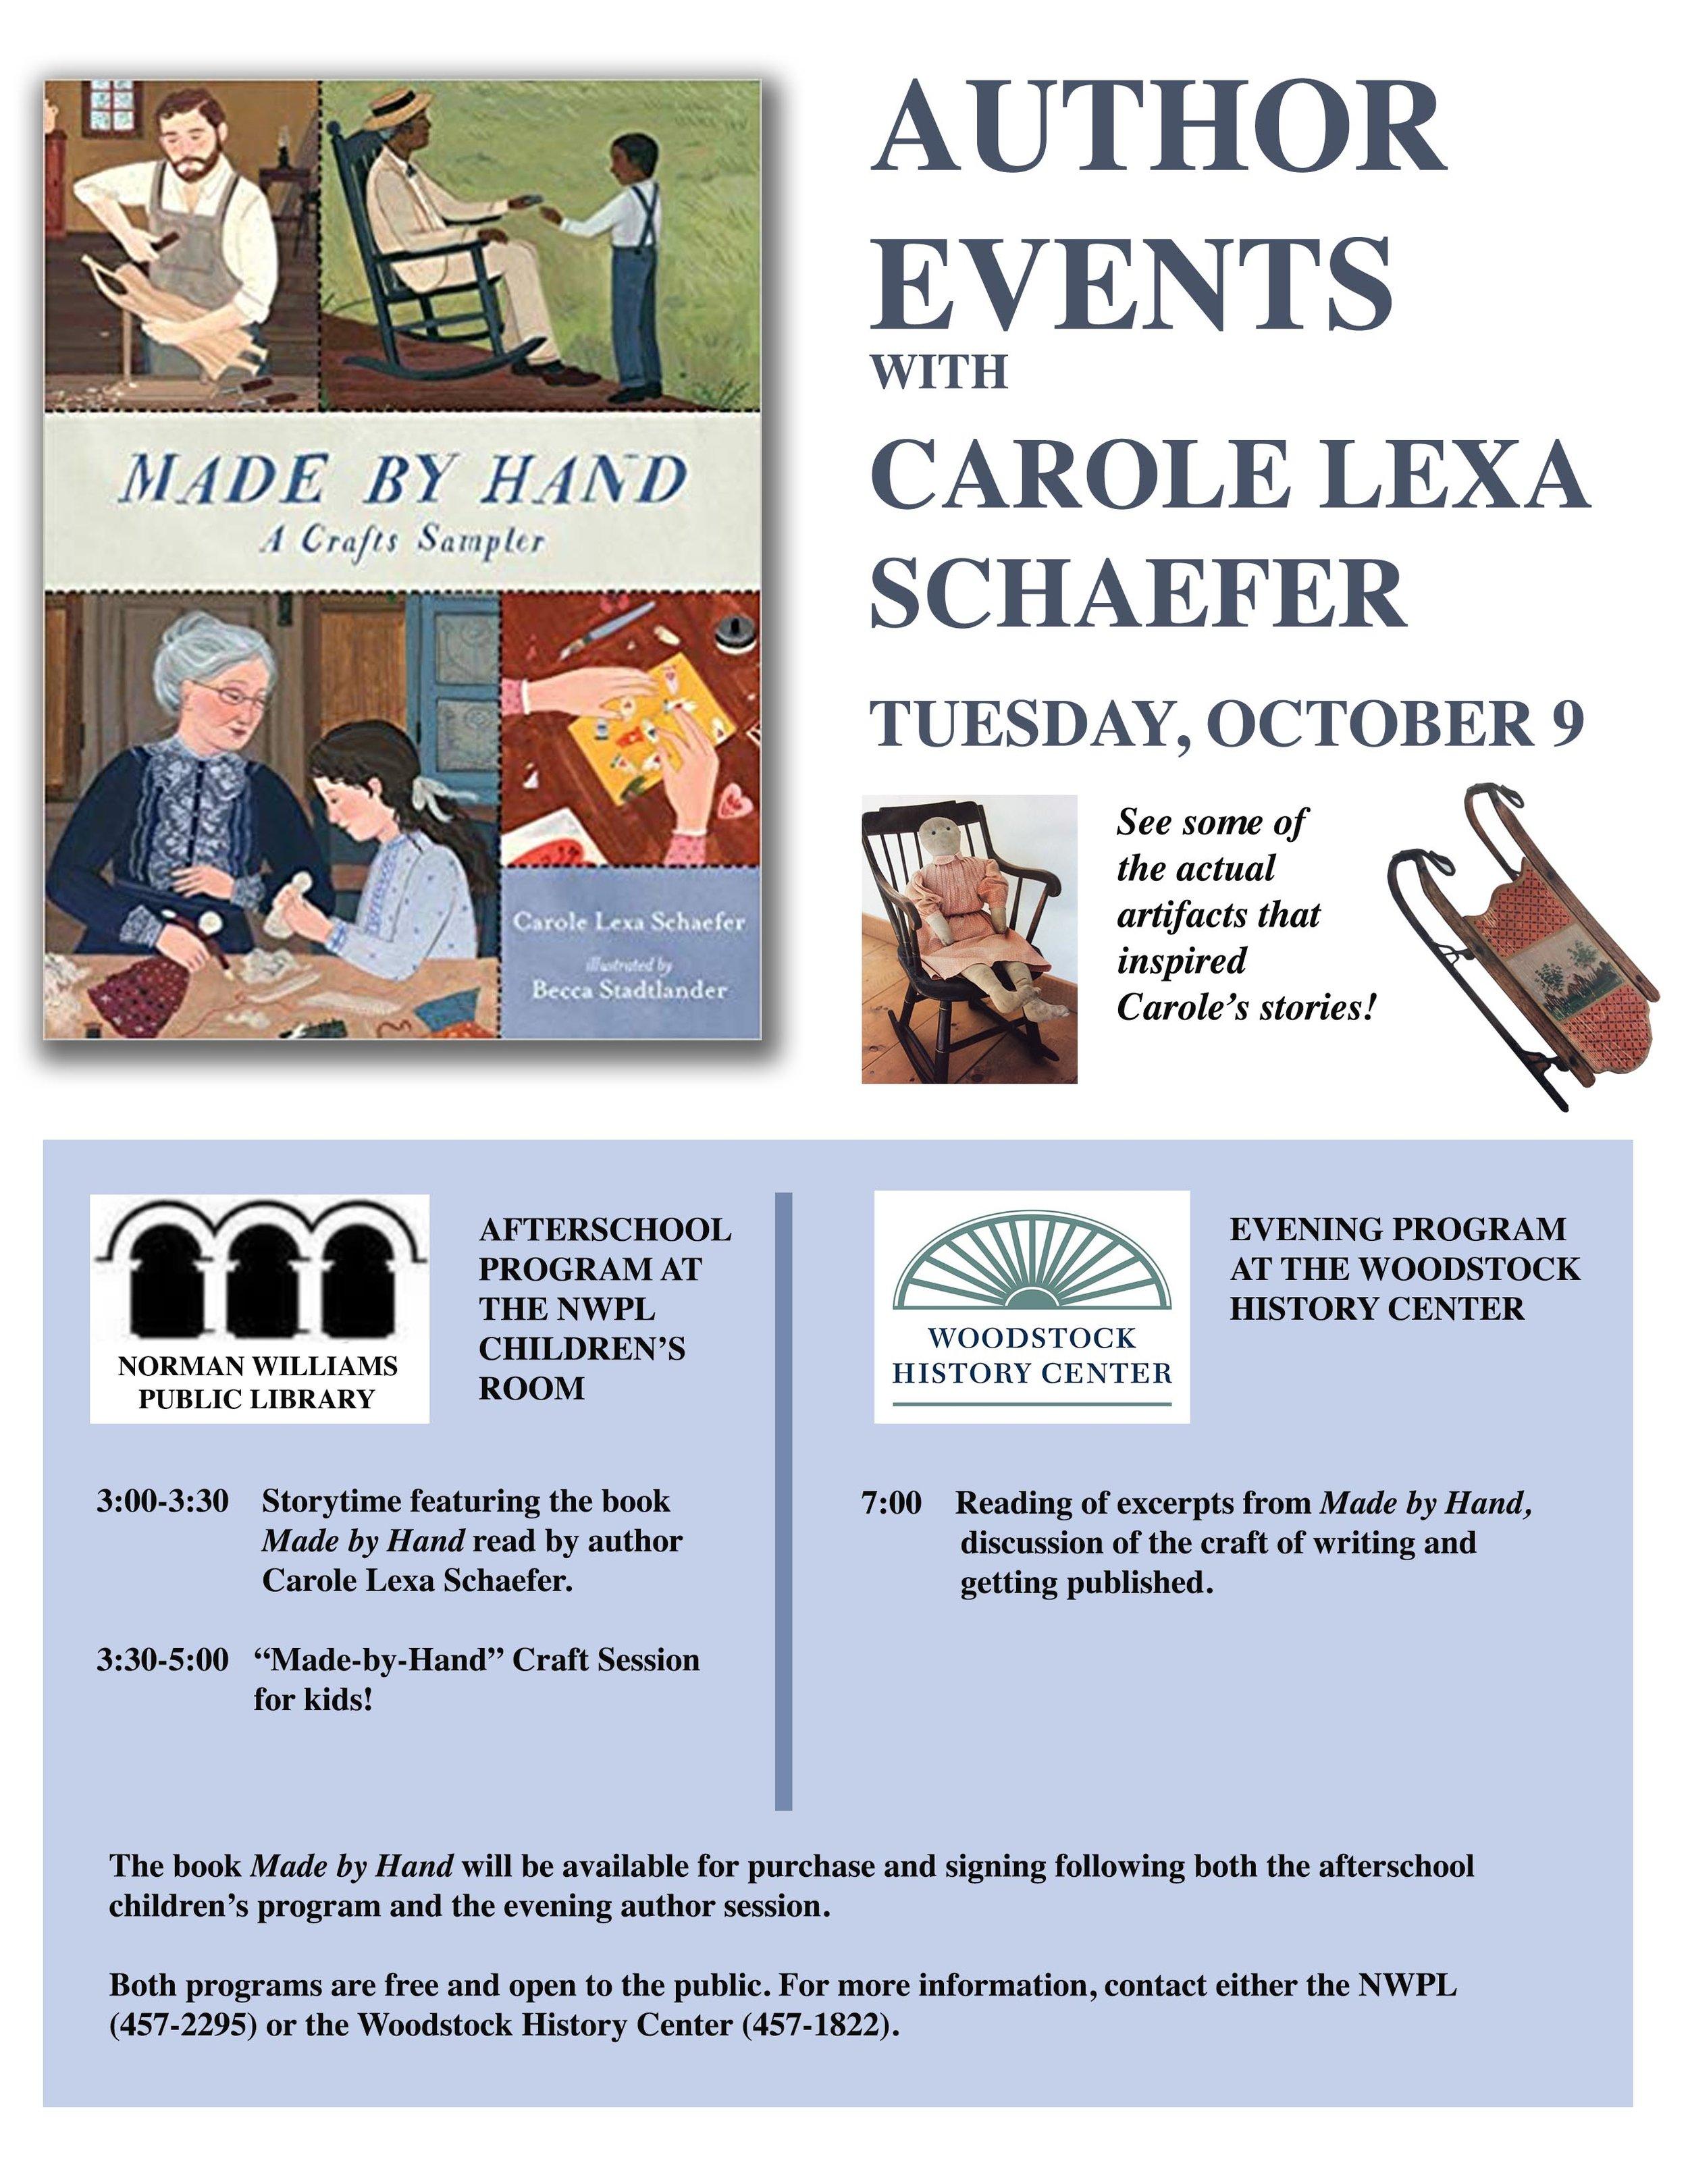 Author Carole Lexa Schaefer poster.jpg